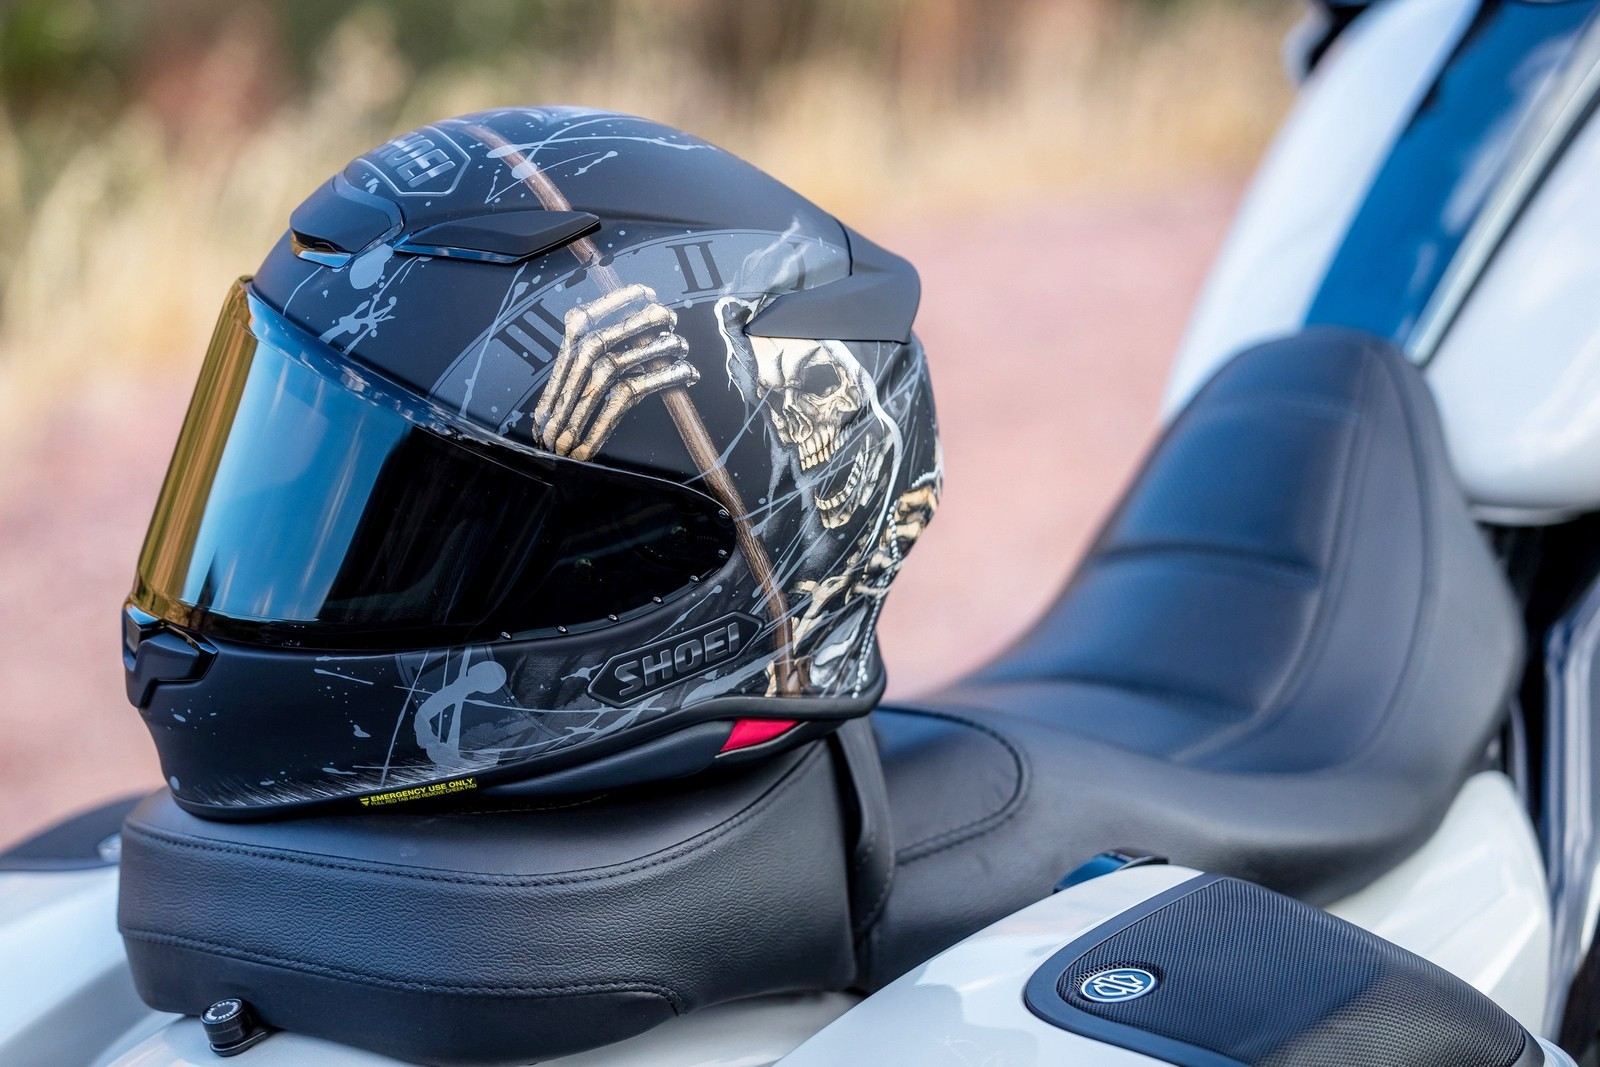 The new Shoei RF-1400 helmet sitting on a Harley Davidson seat.